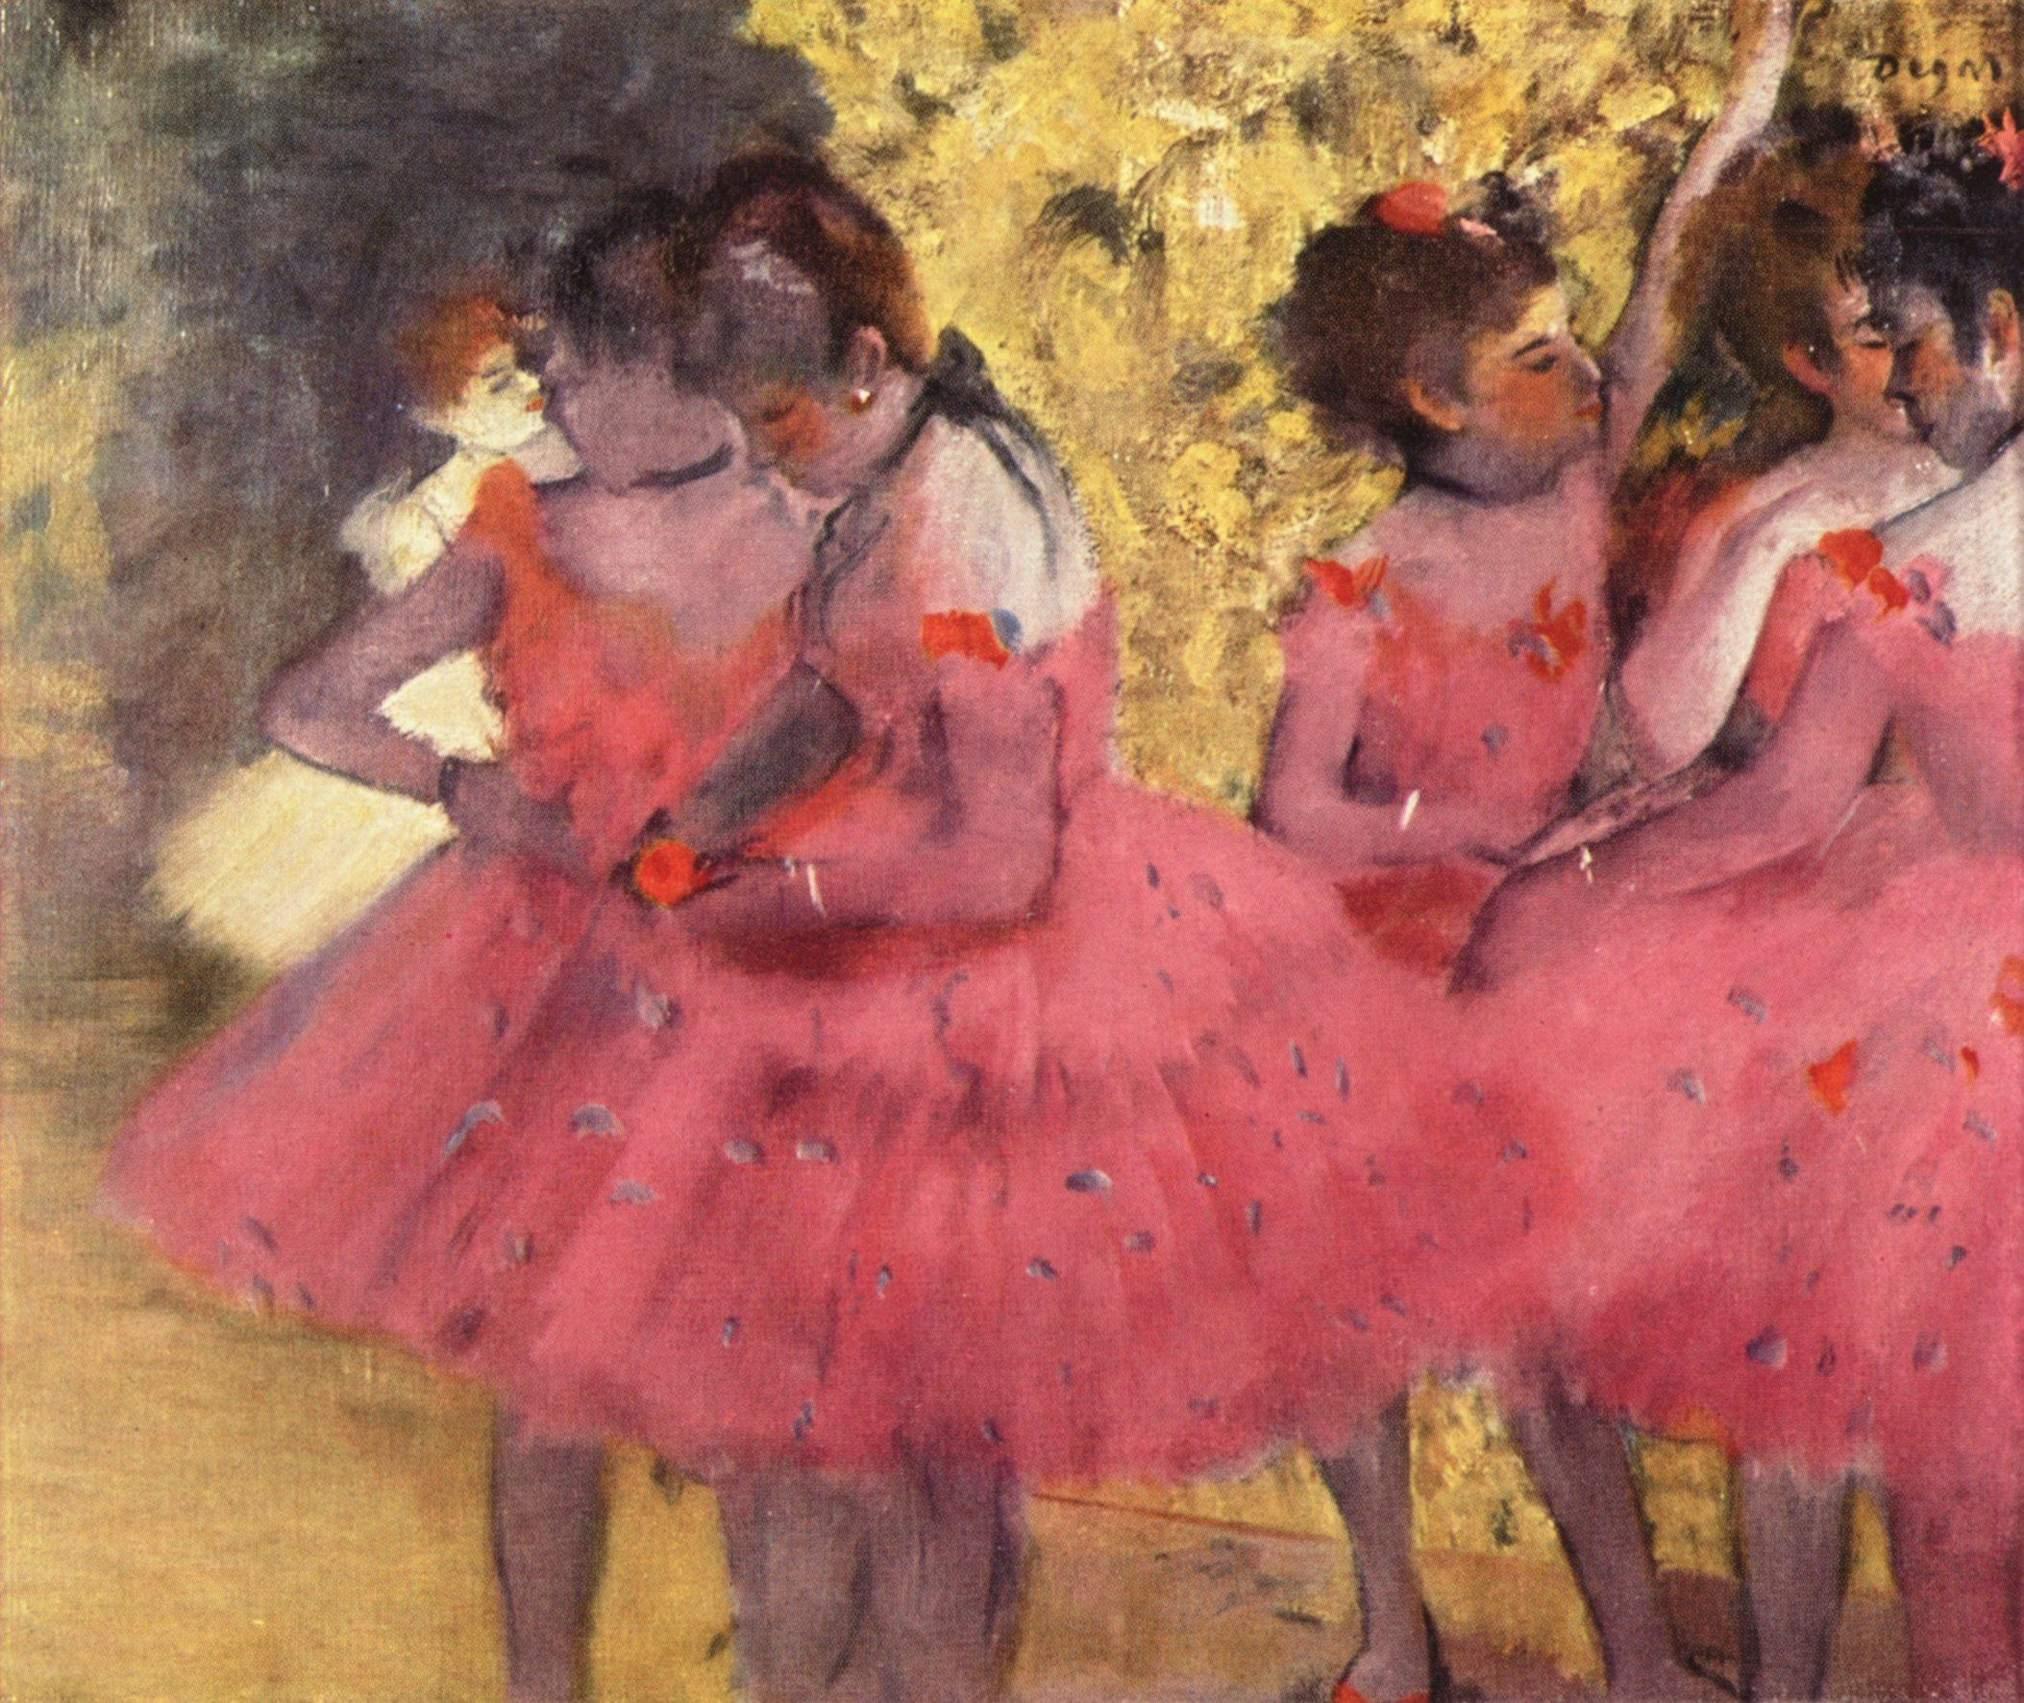 Bailarinas en rosa, después del ensayo, Edgar Degas, 1884. Ny Carlsberg, Glypotek, Copenhagen